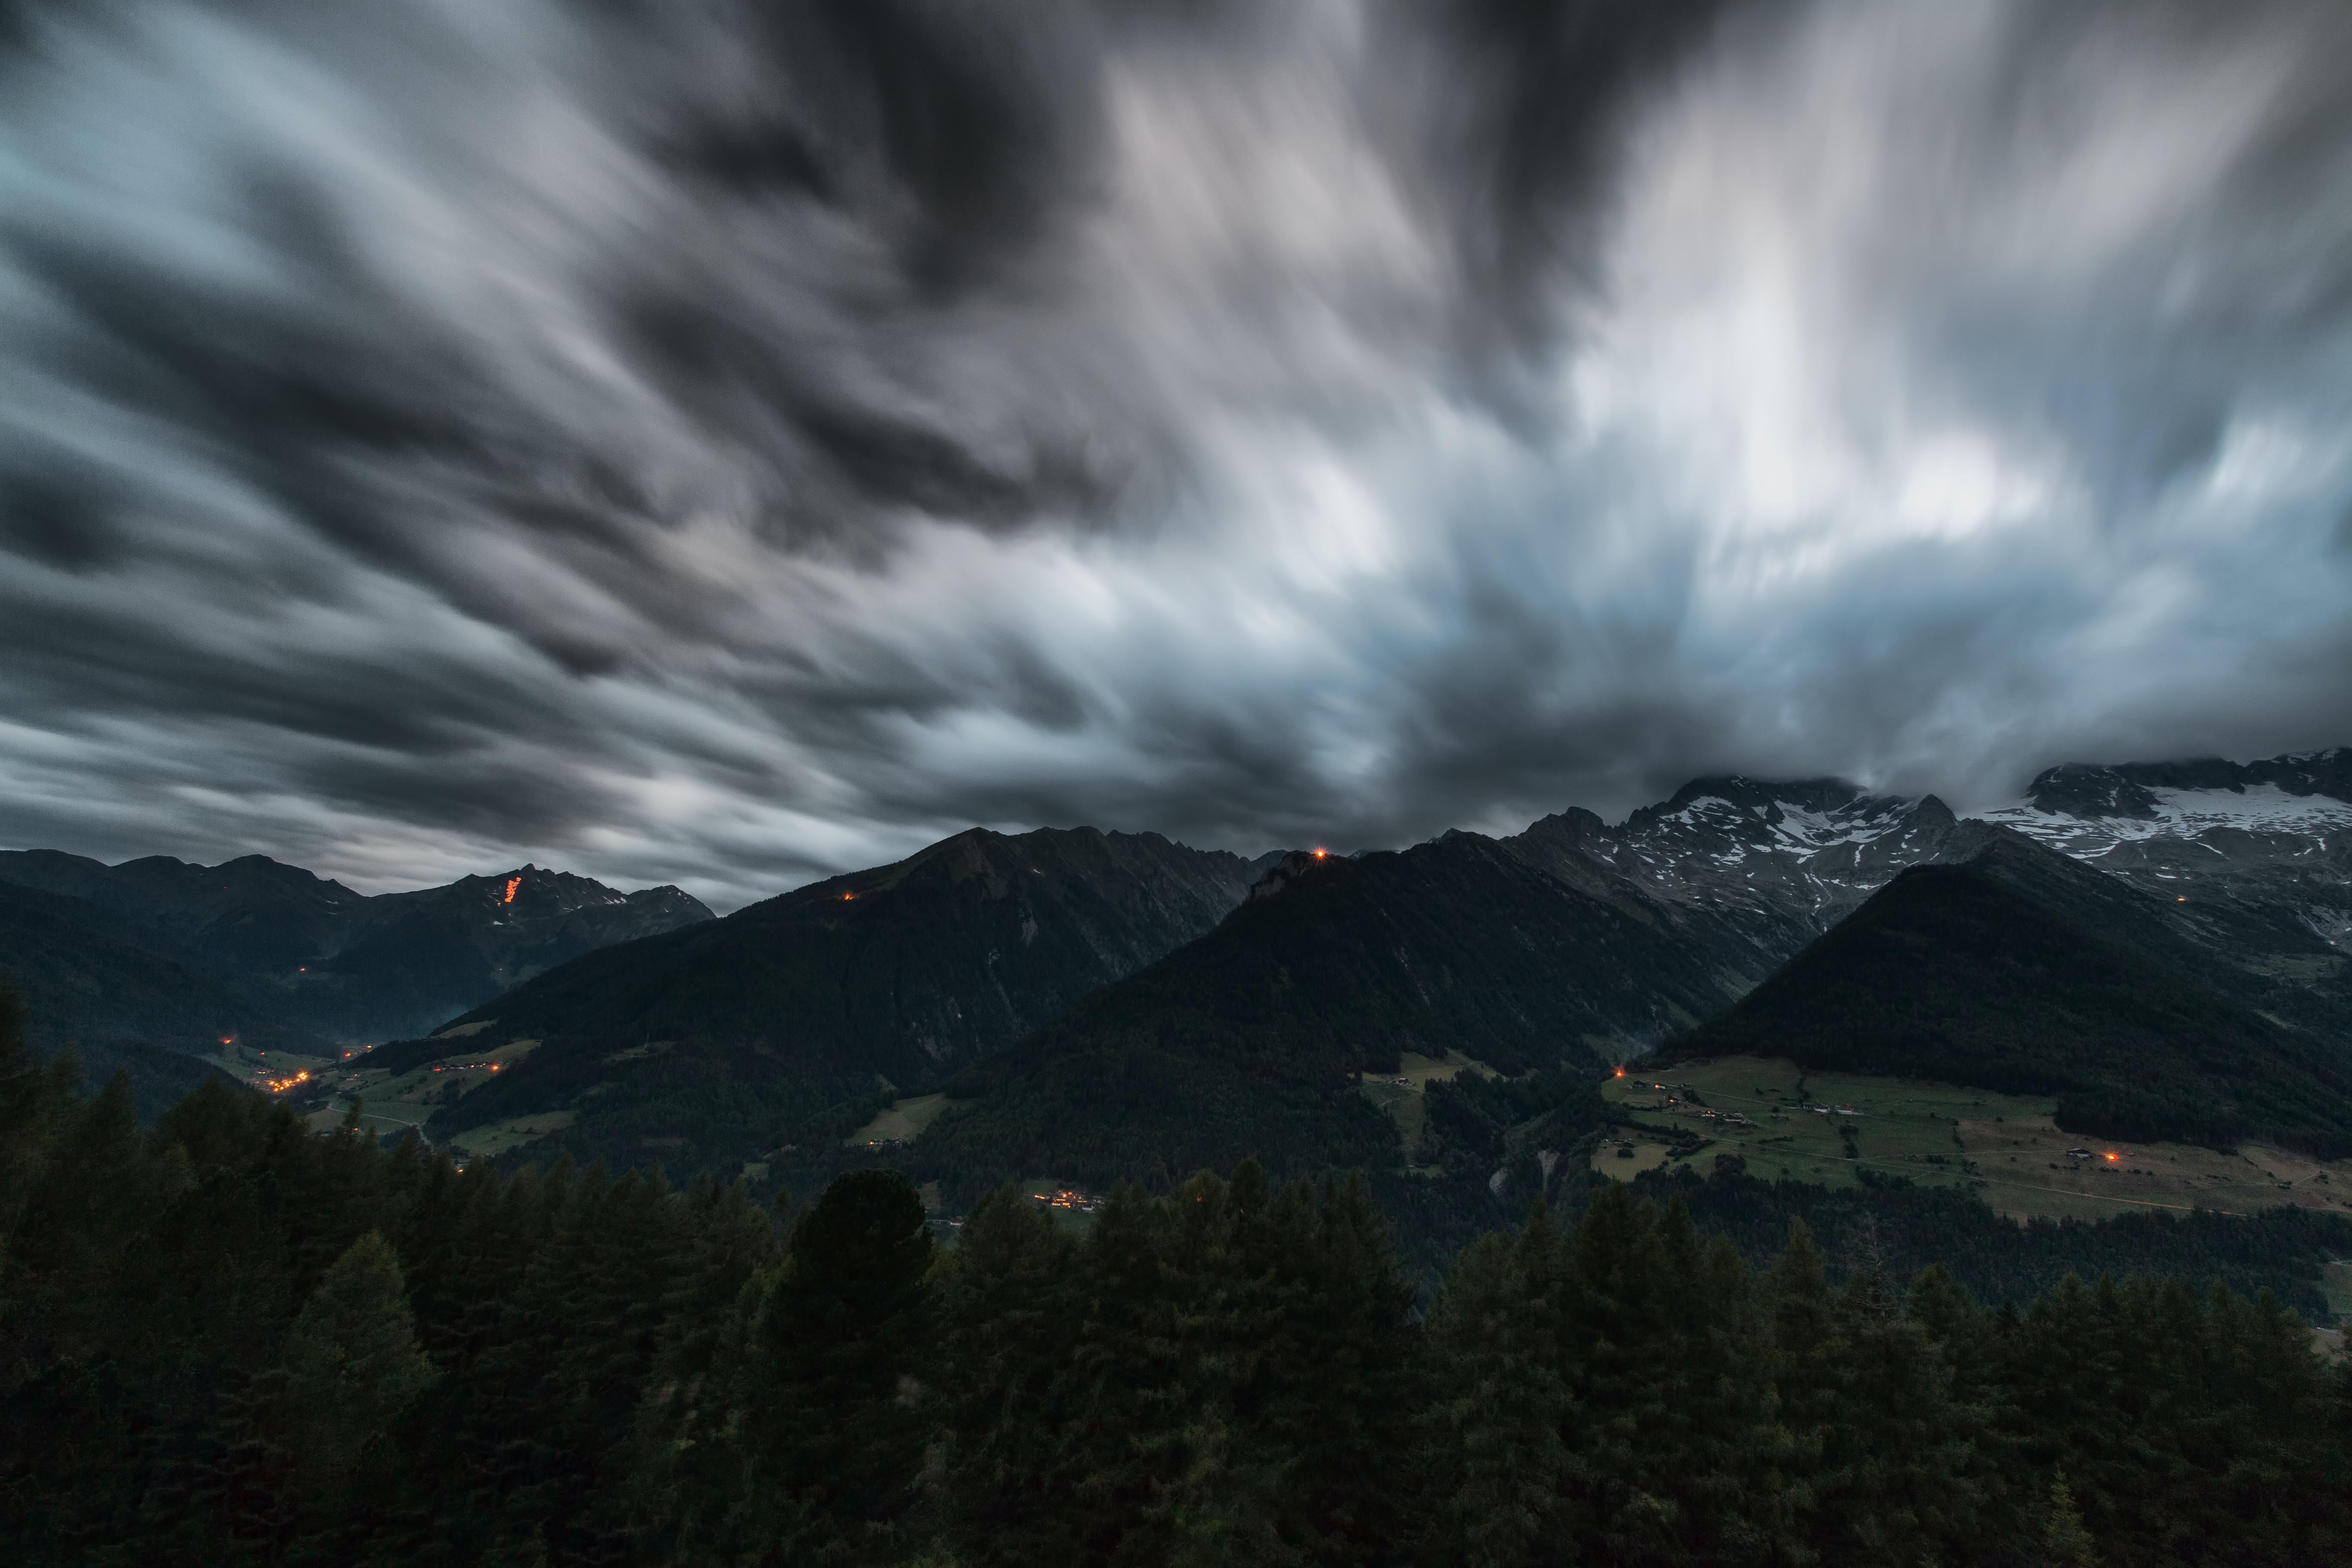 black mountain under nimbus clouds